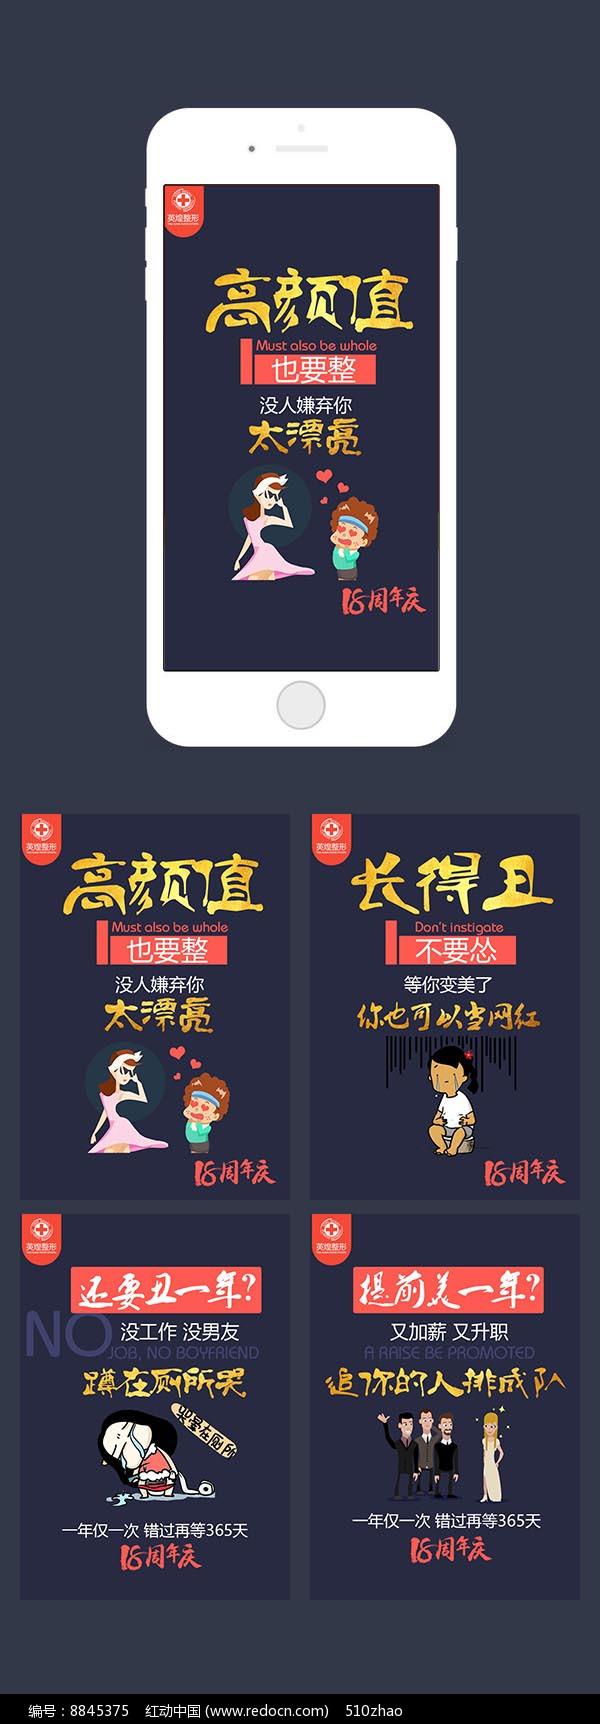 H5整形手机页面模板图片